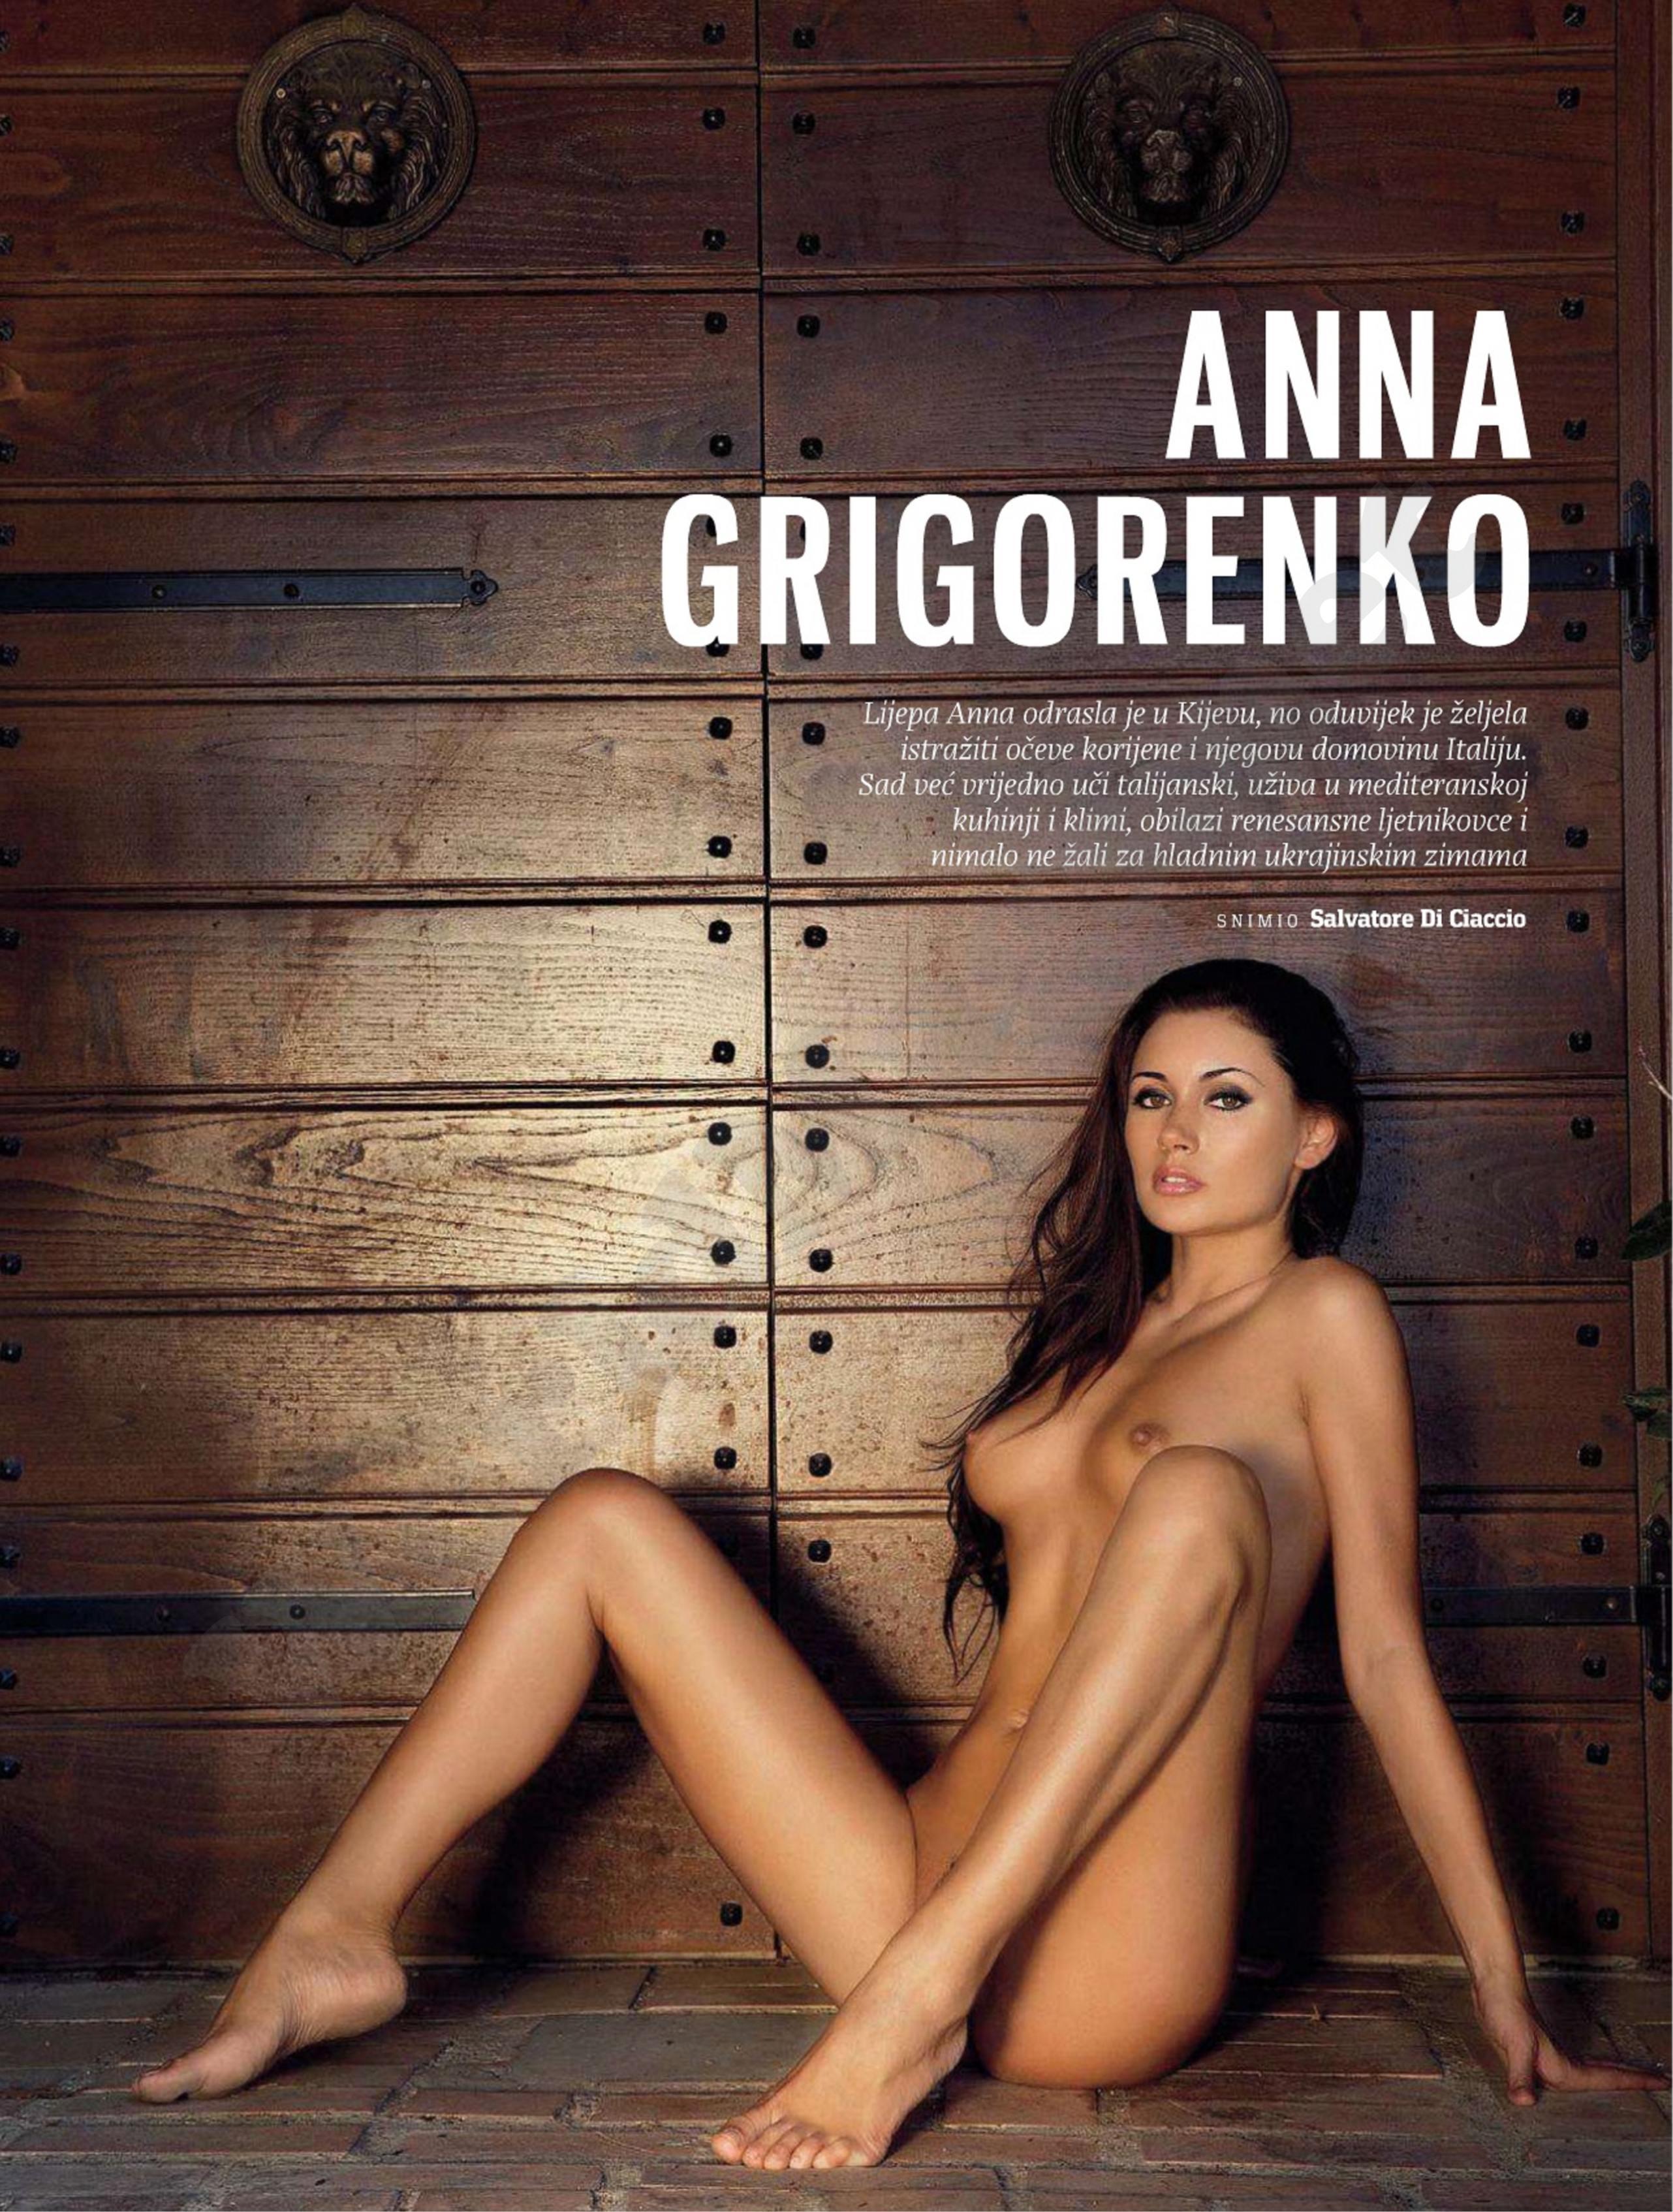 441741922_Playboy_2_2012_Croatia_Scanof.net_039_123_190lo.jpg